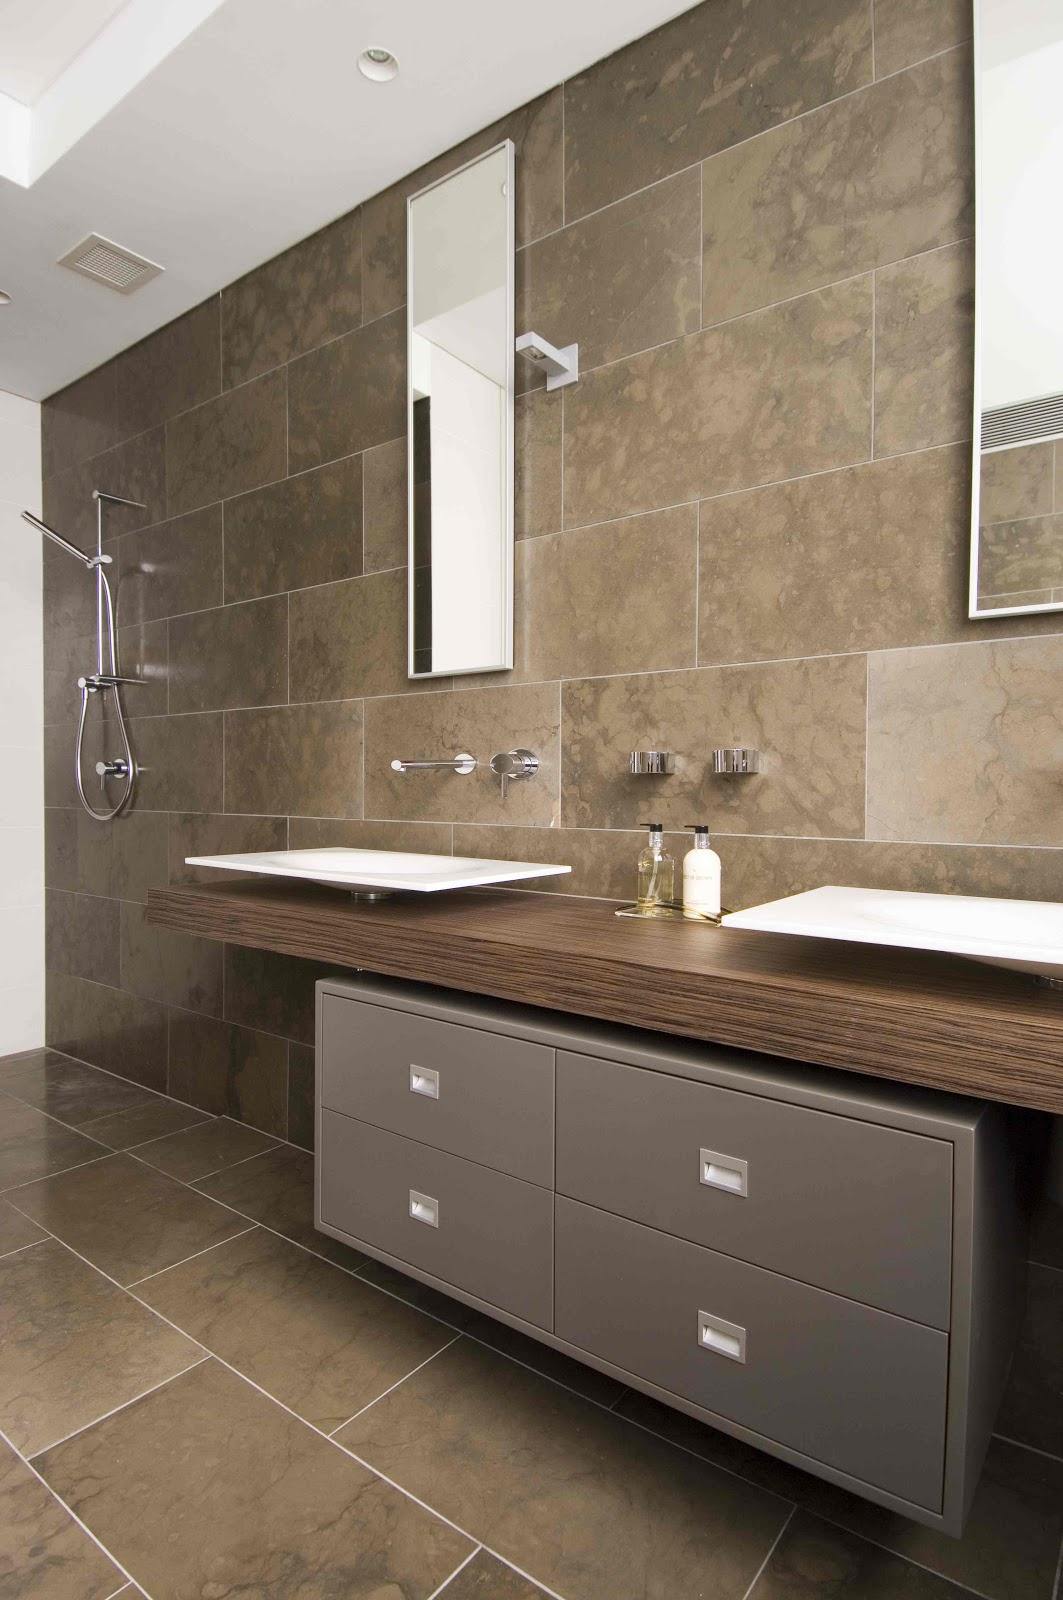 Magnificent Rectangular Bathroom Design Ideas 1063 x 1600 · 240 kB · jpeg